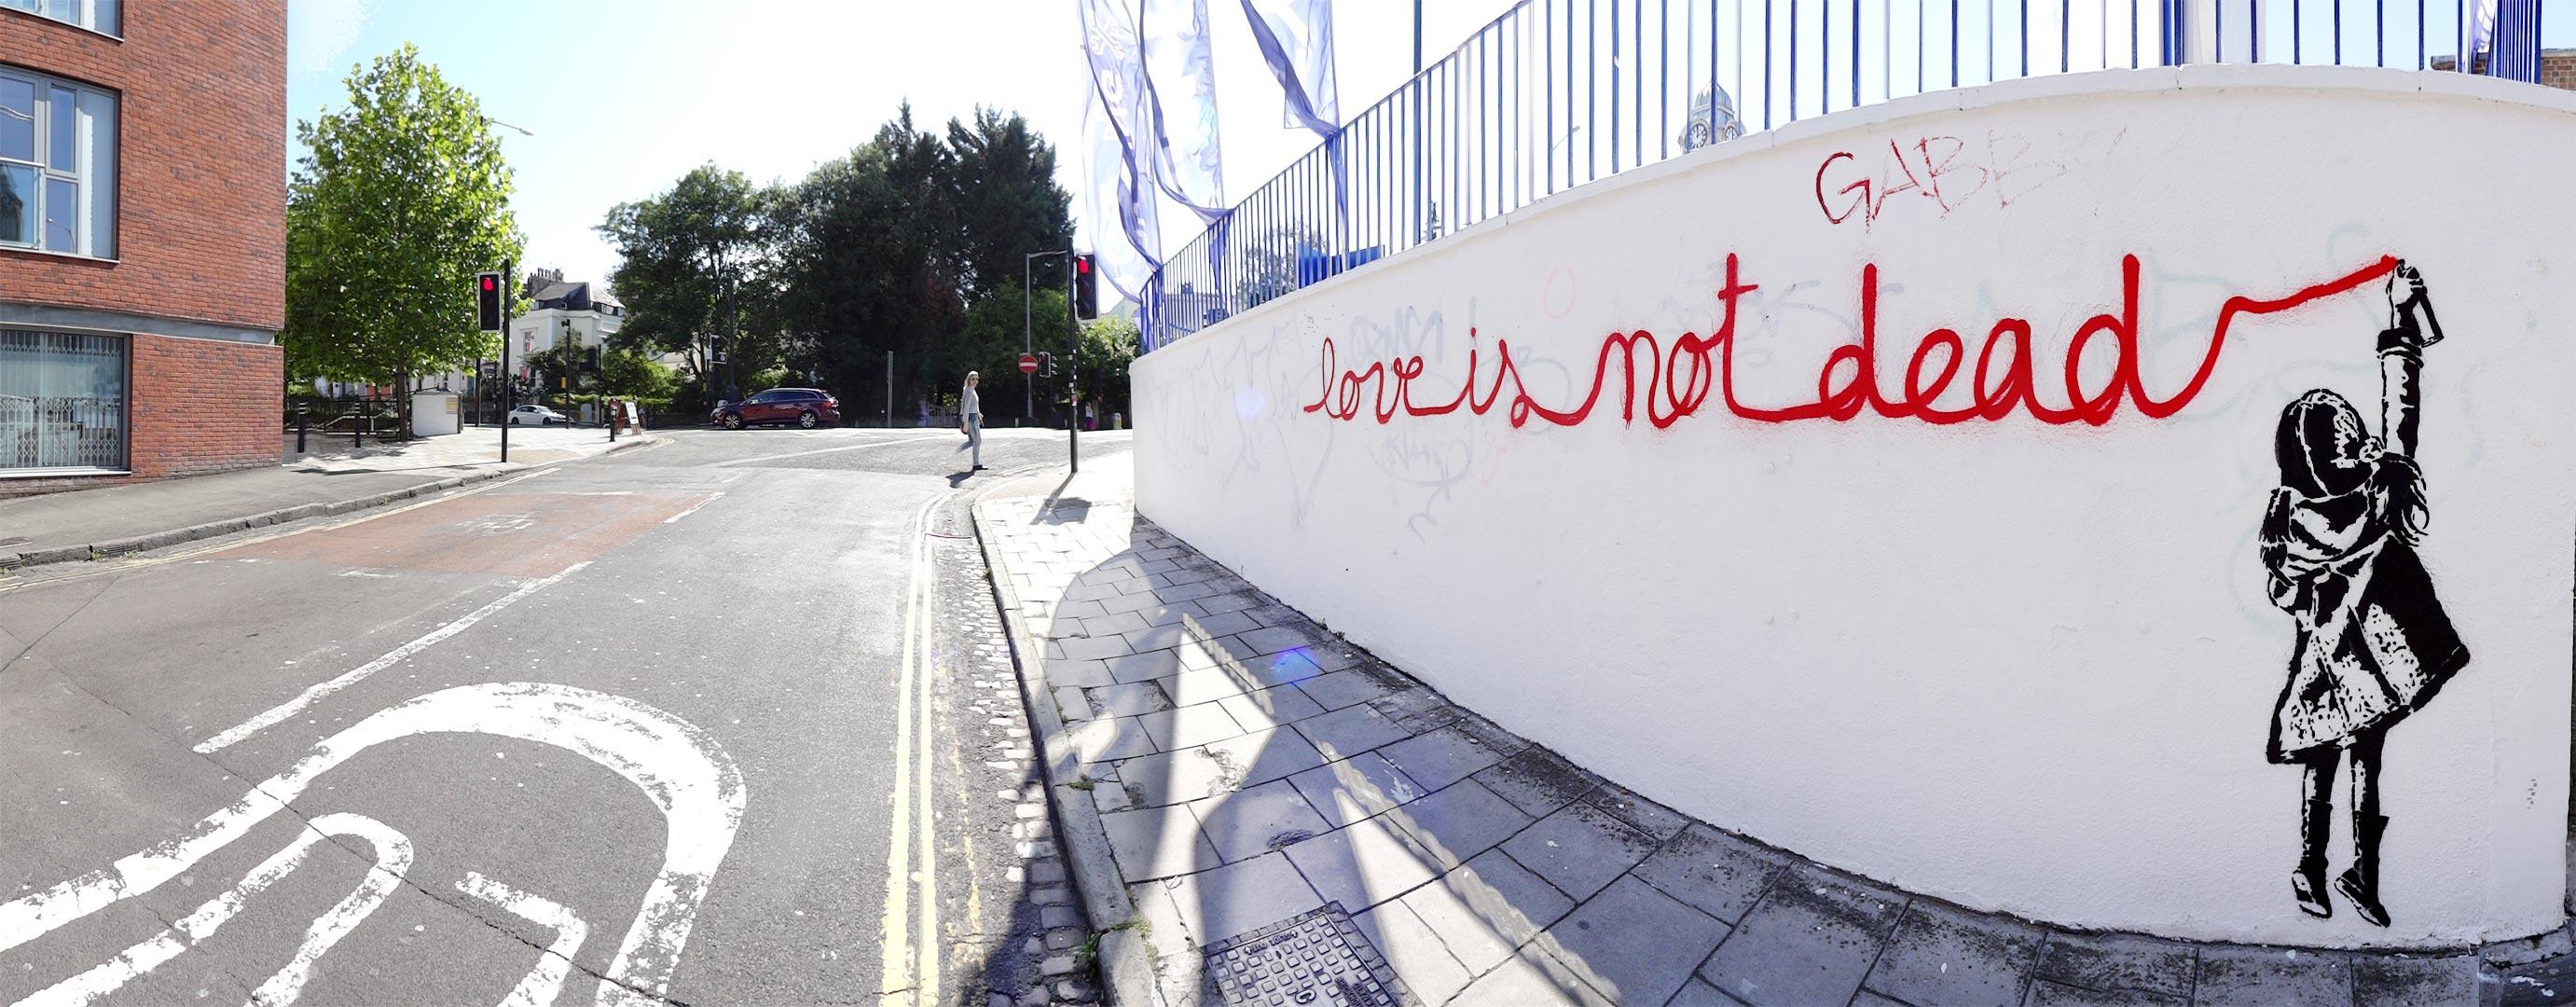 Goin - LOVE IS NOT DEAD - Bristol (UK) - 2015